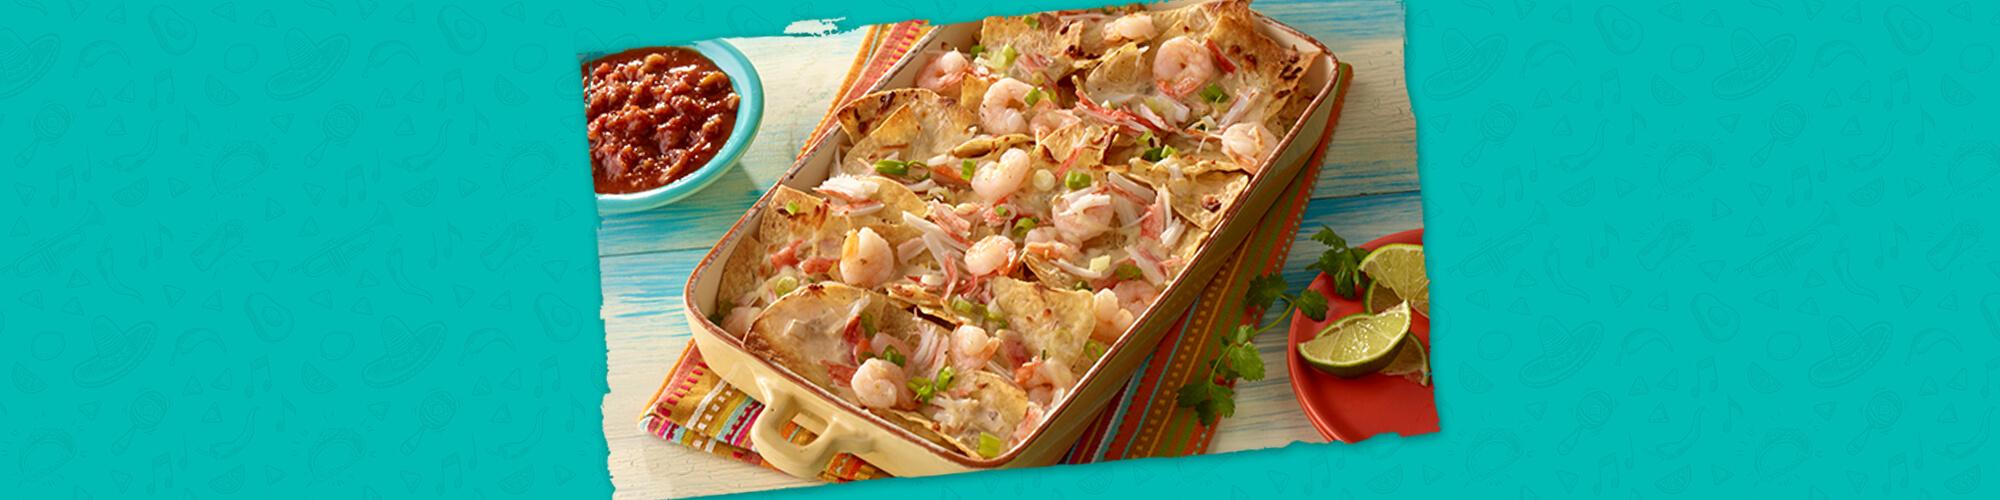 Salsas seafood nachos